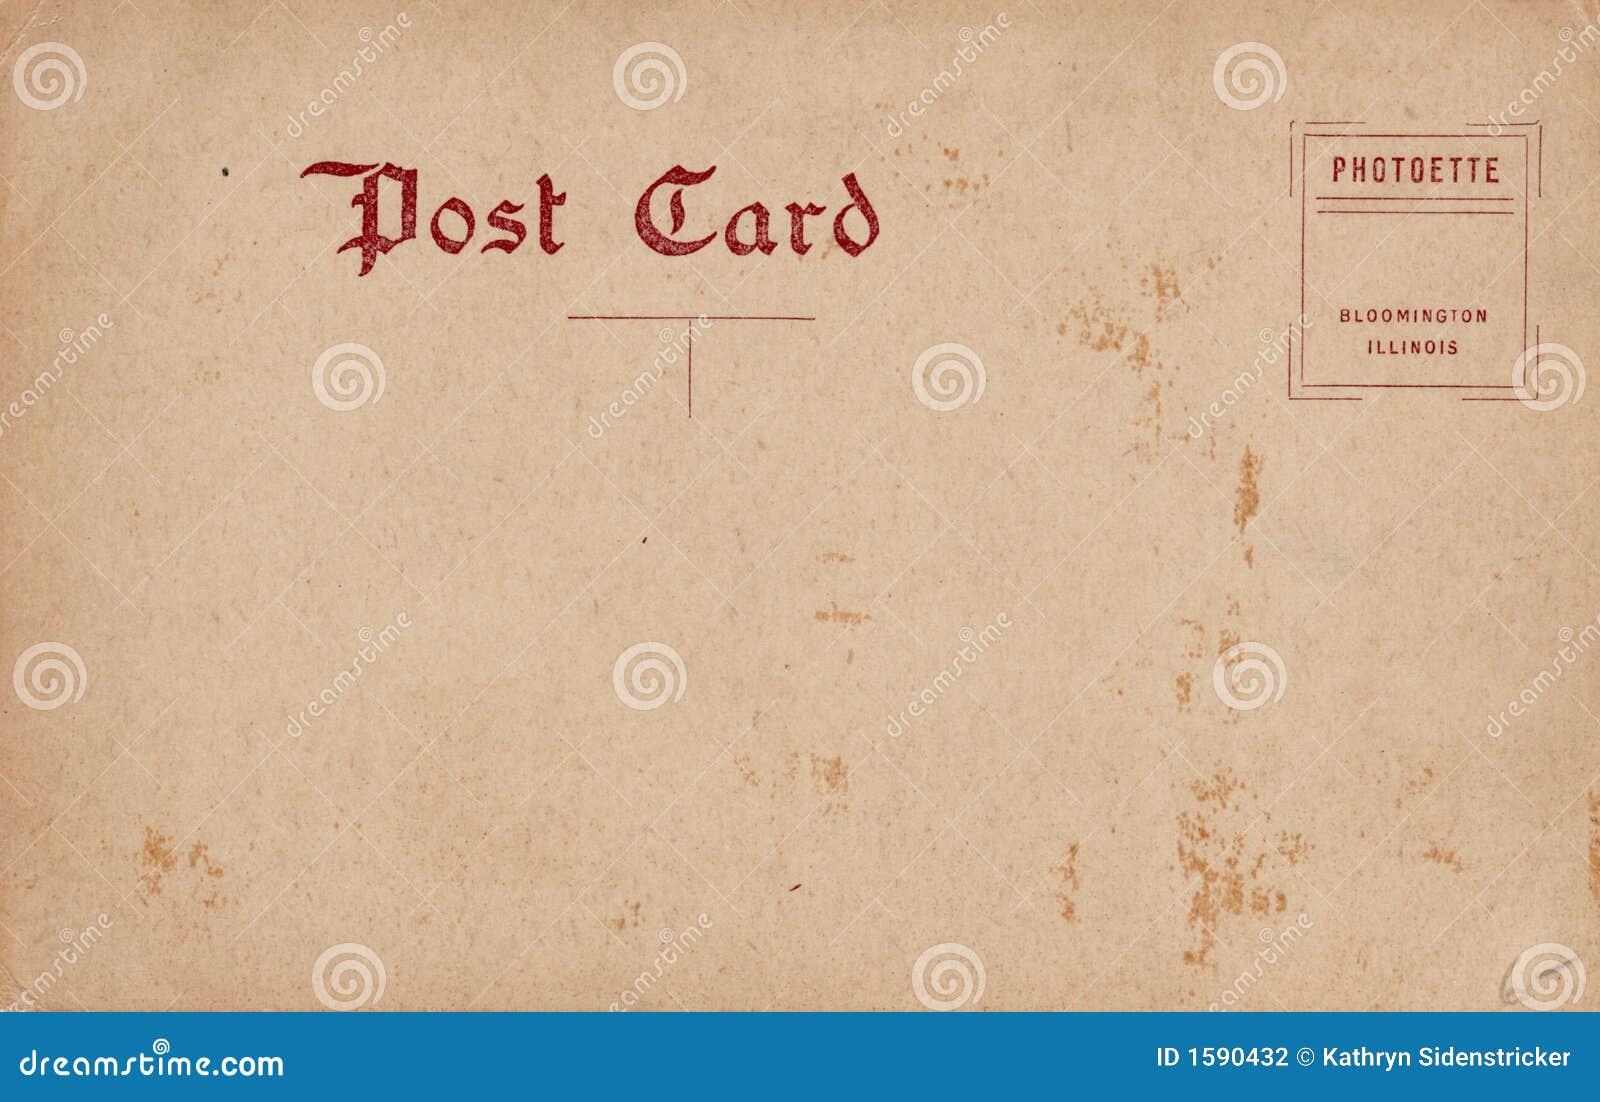 Italian handwritten postcard letter stock photo image 39254147 - Blank Vintage Postcard 1910 S Stock Photography Image 1590432